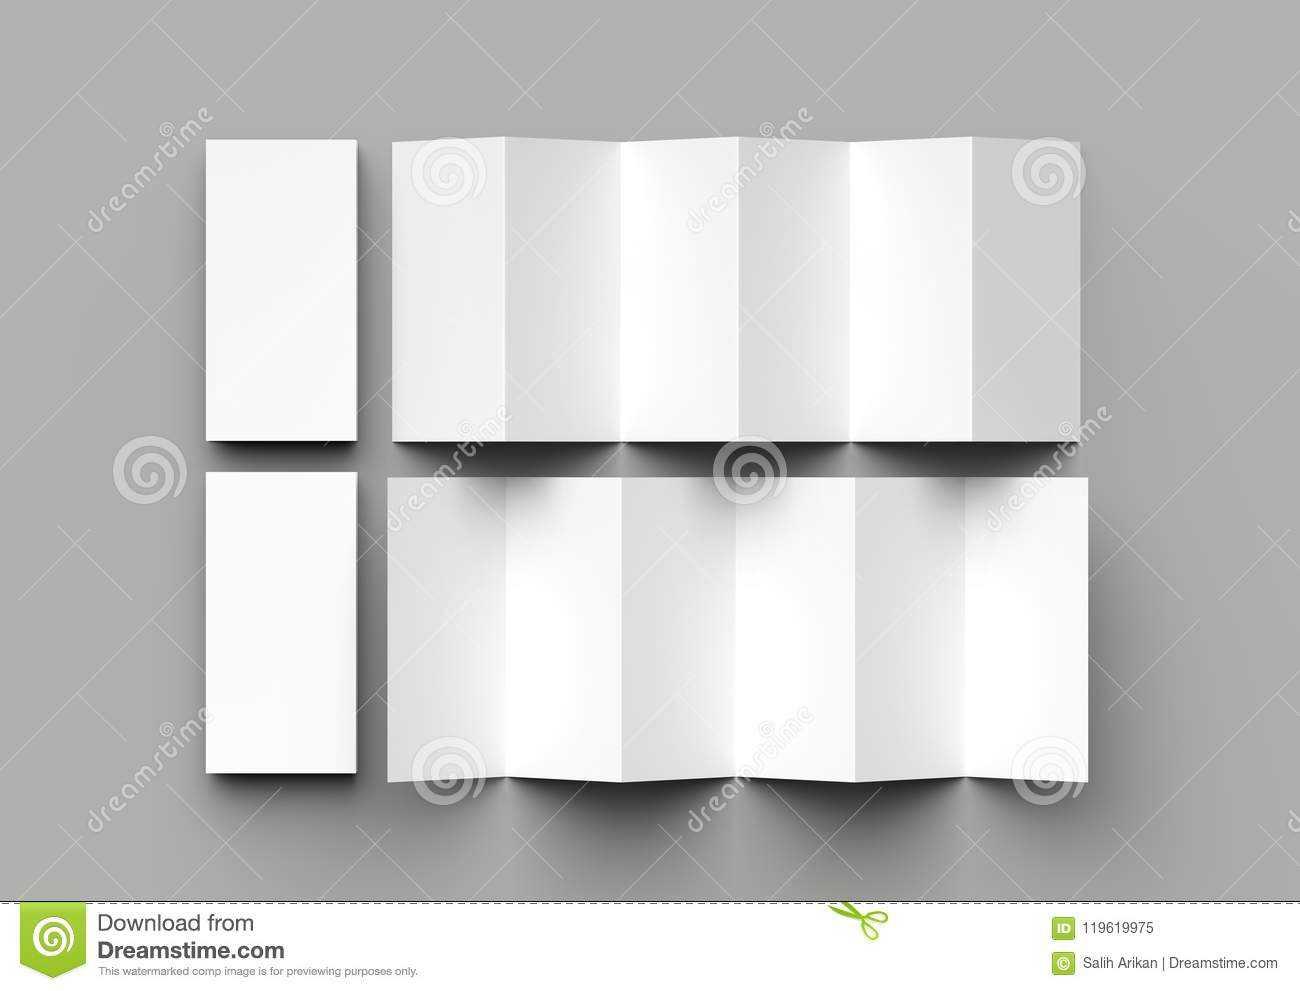 12 Page Leaflet, 6 Panel Accordion Fold - Z Fold Vertical Inside 6 Panel Brochure Template